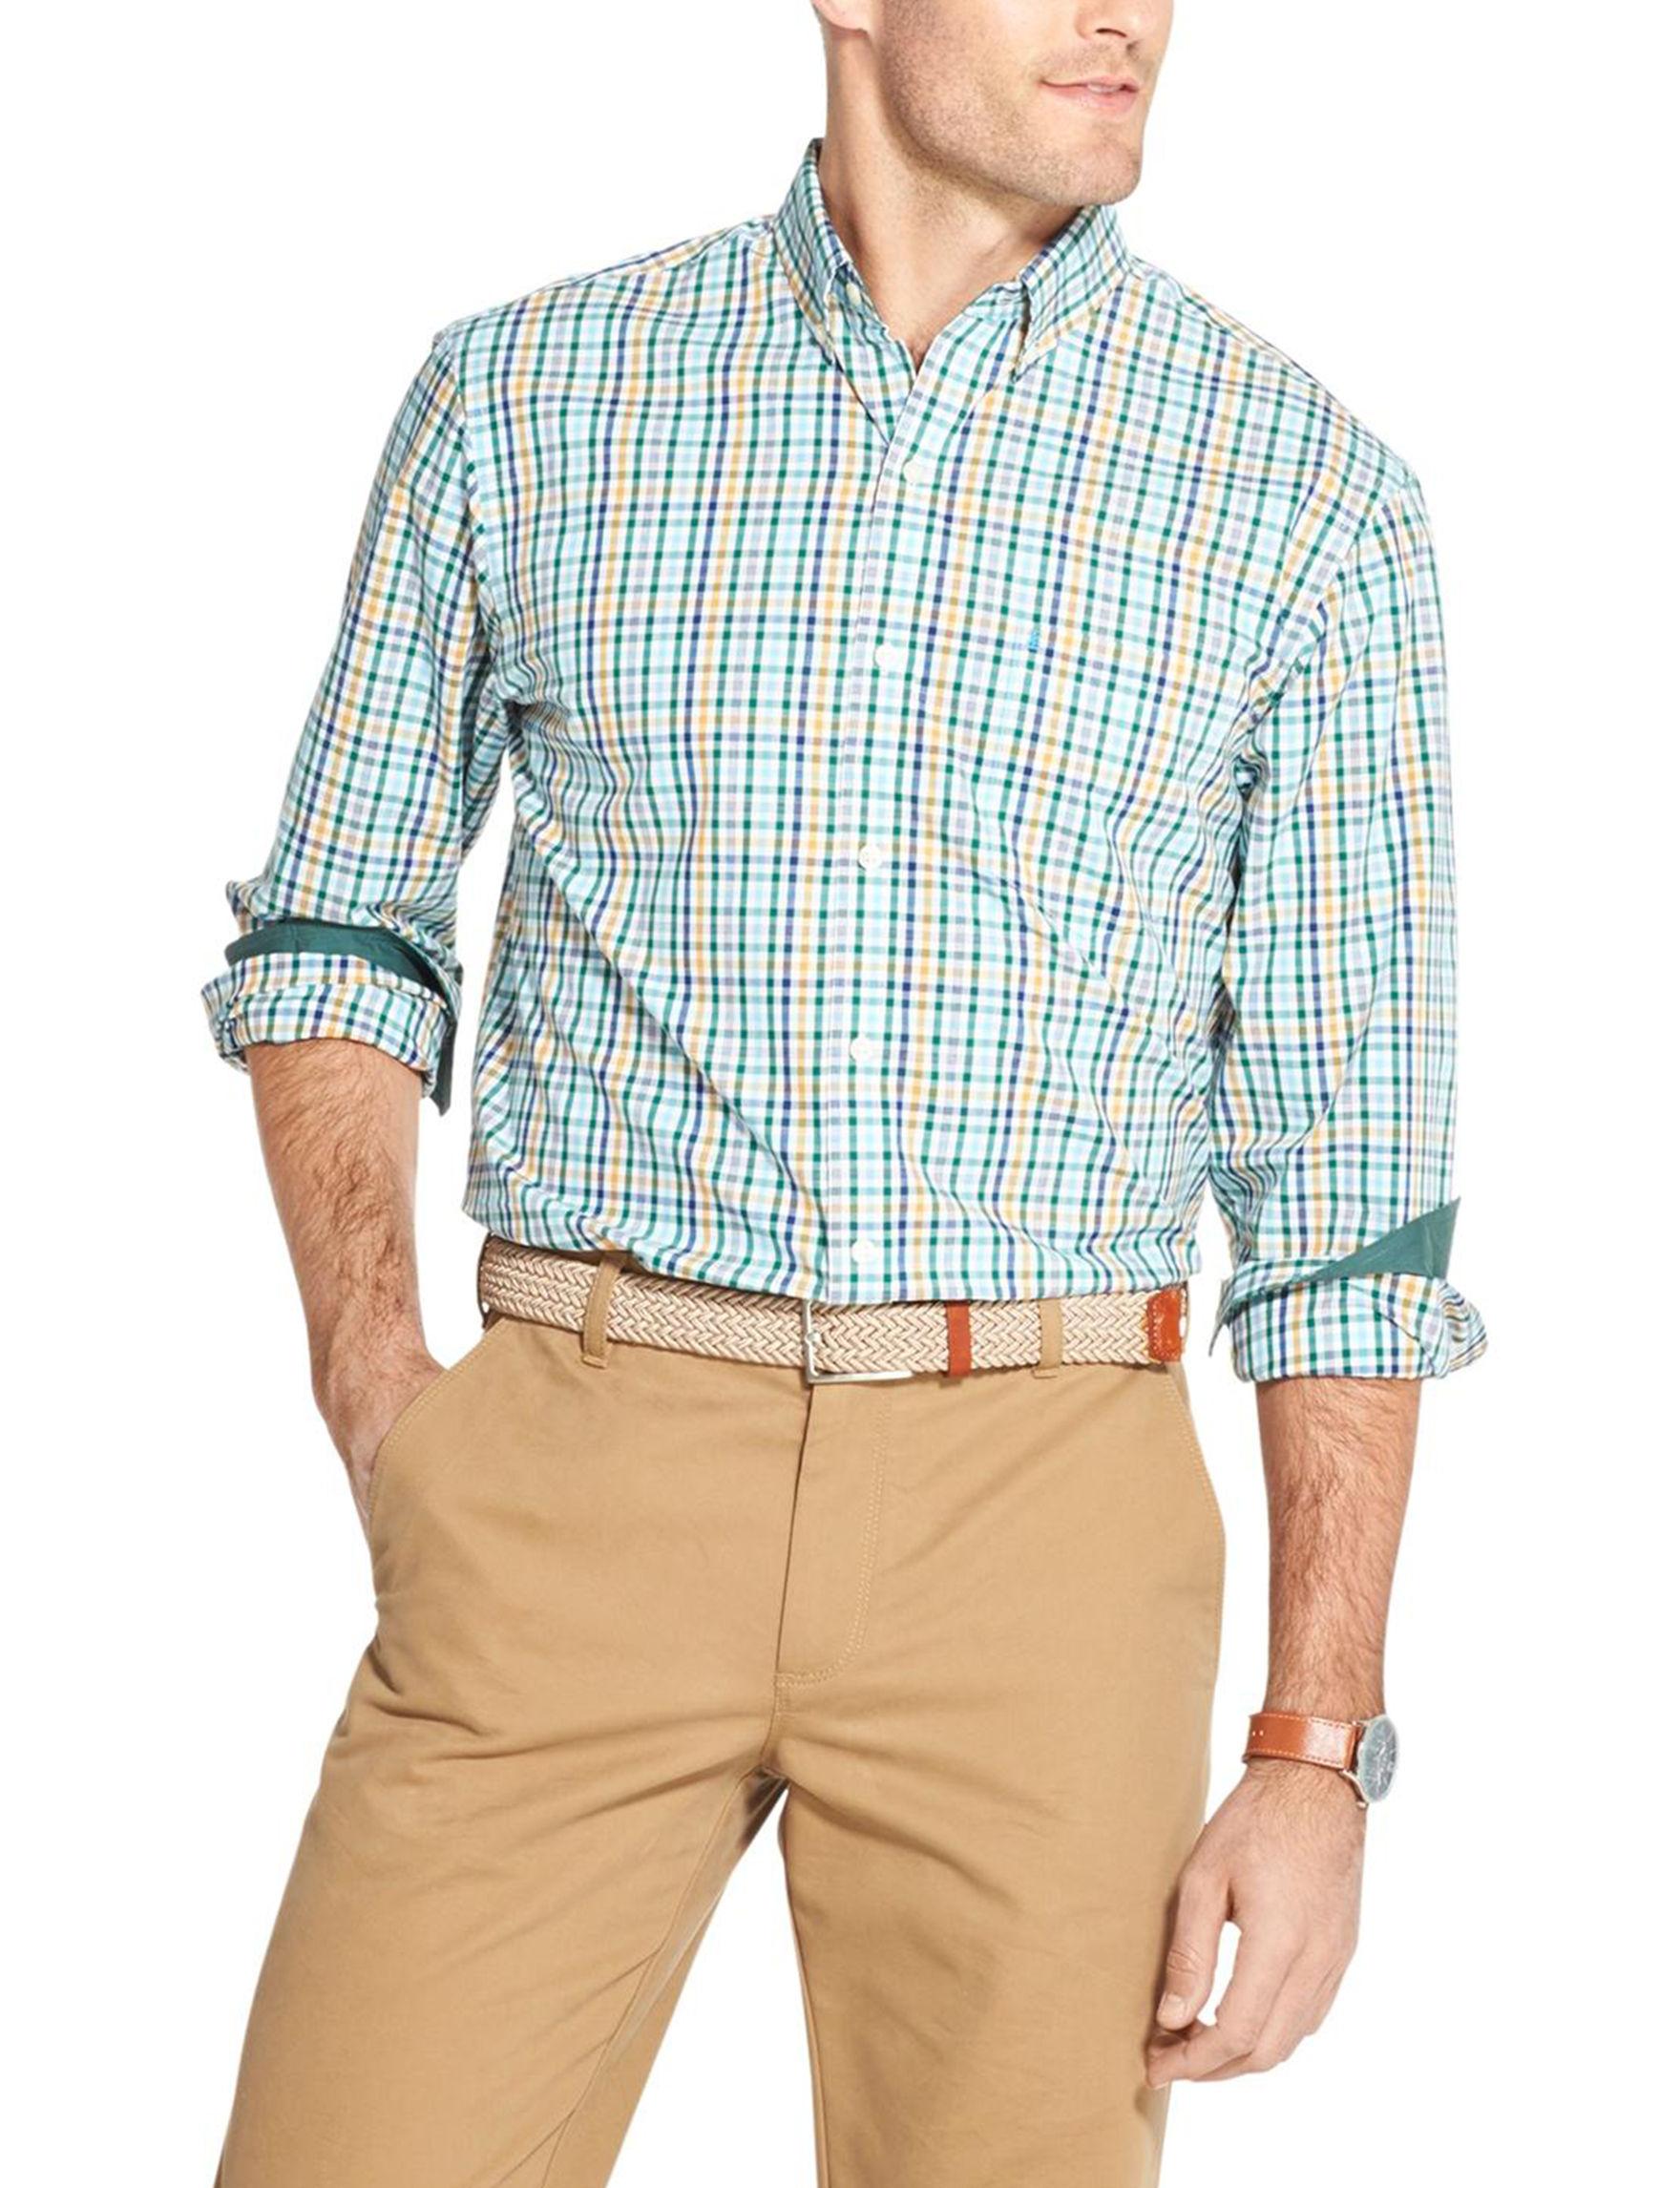 Izod Evergreen Casual Button Down Shirts